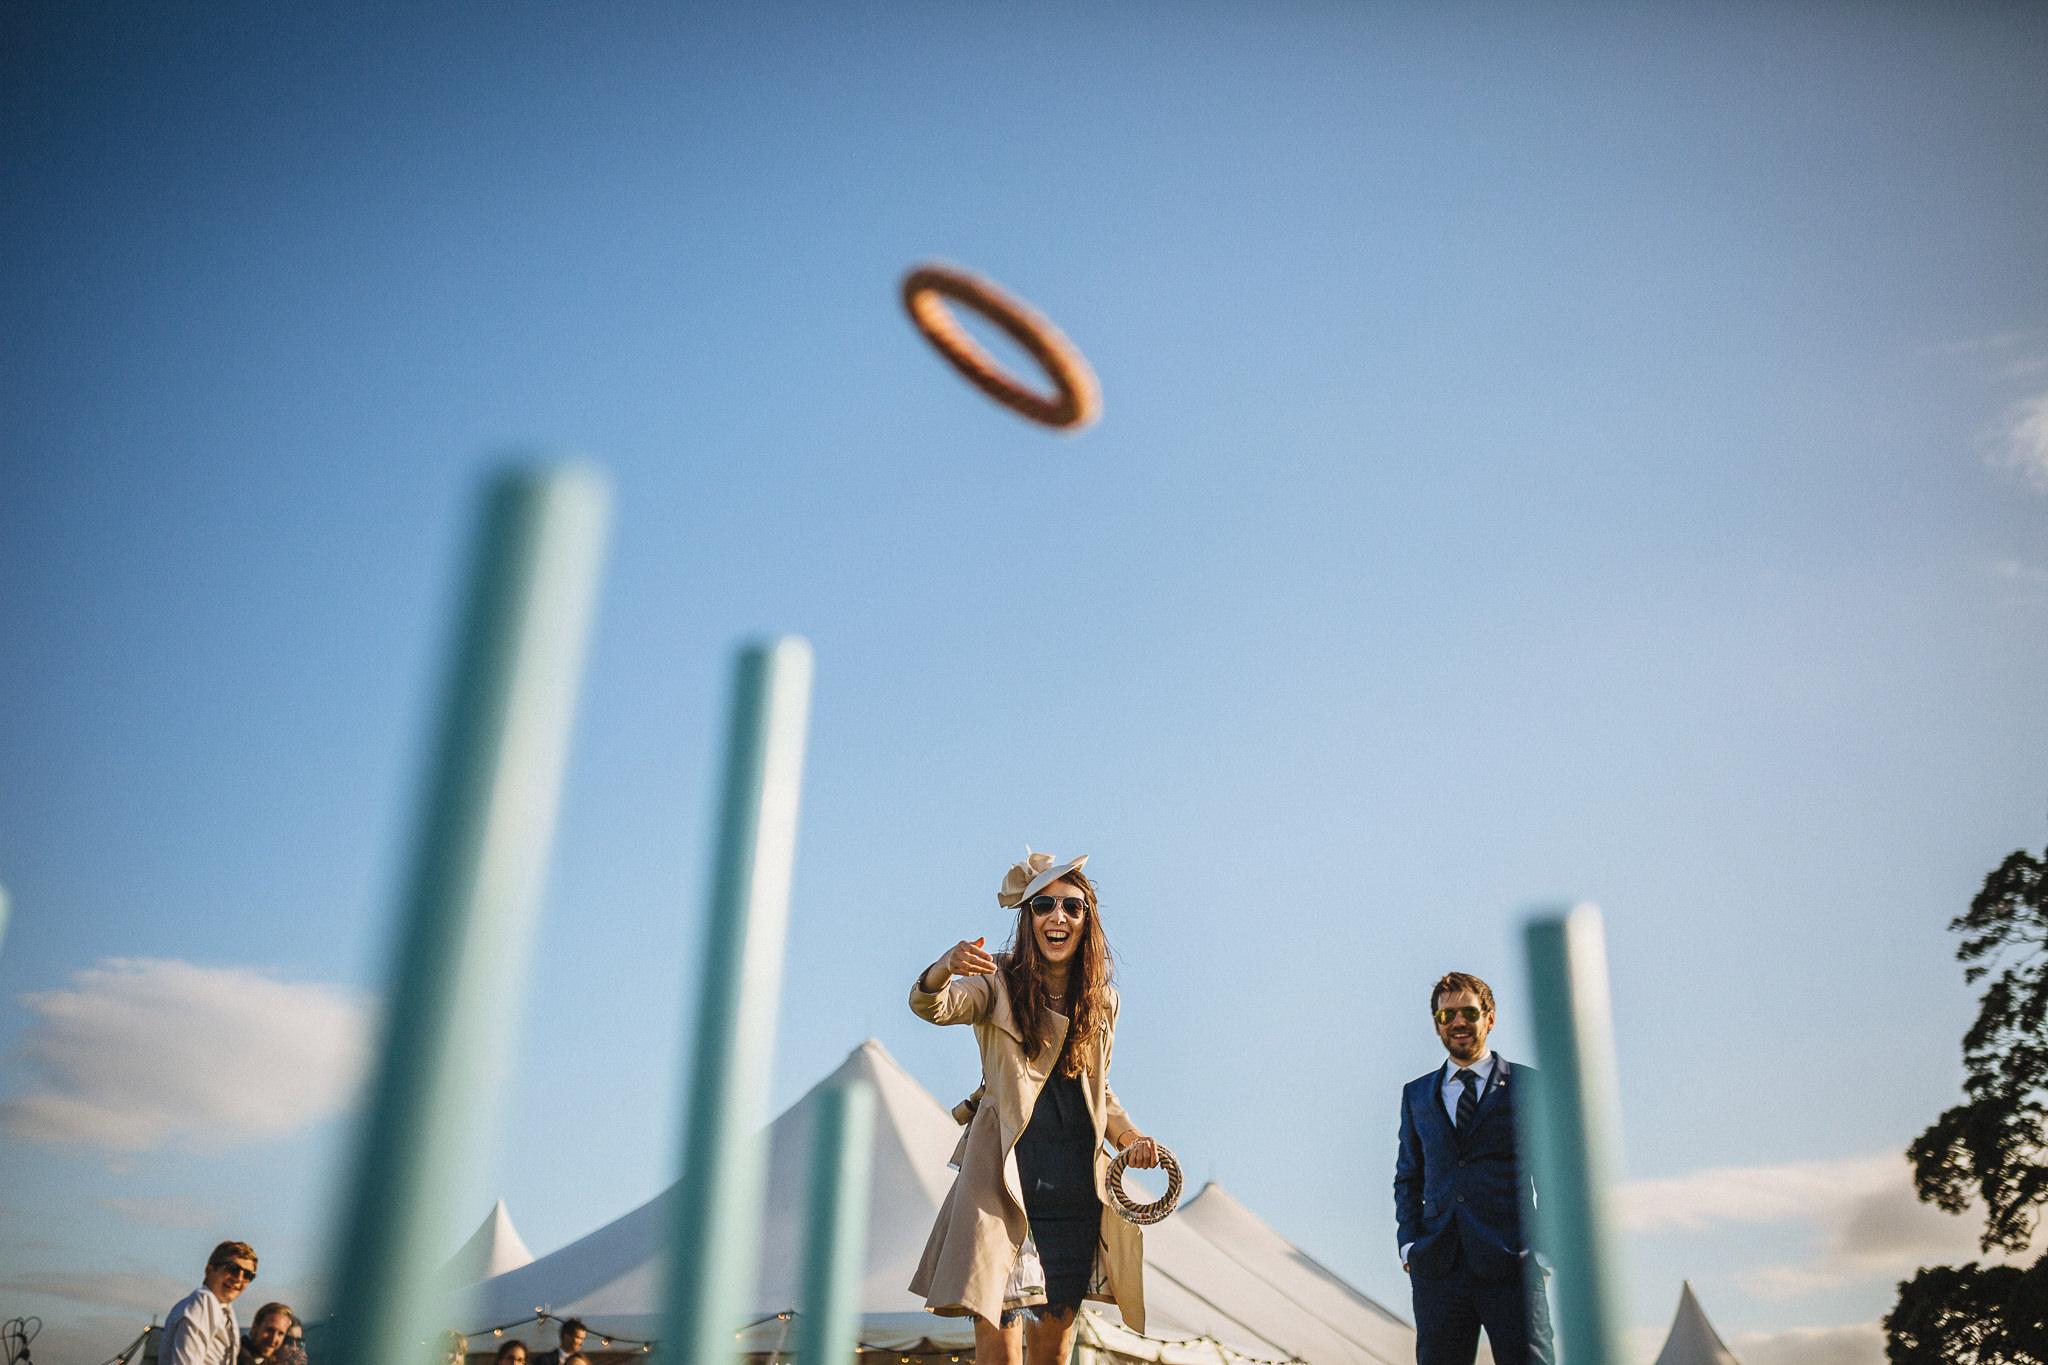 paul-marbrook-Farm-Wedding-Photographer-Lancashire-90073